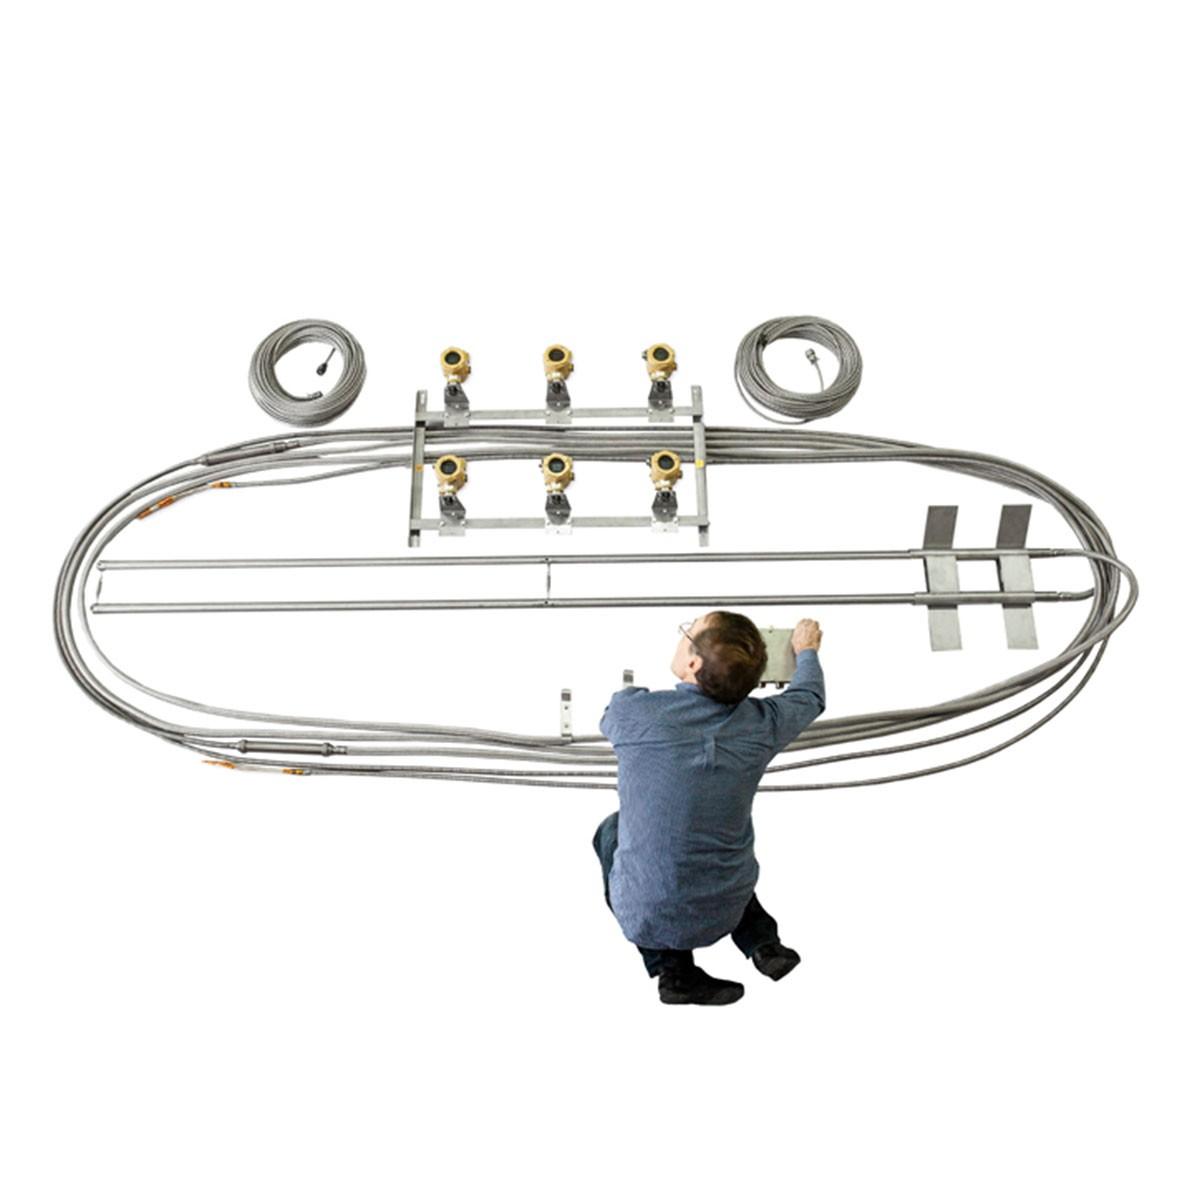 Analog LOCA Qualified Hydrostatic Rressure Transmitters Safir 2536, 2537, 2547 N